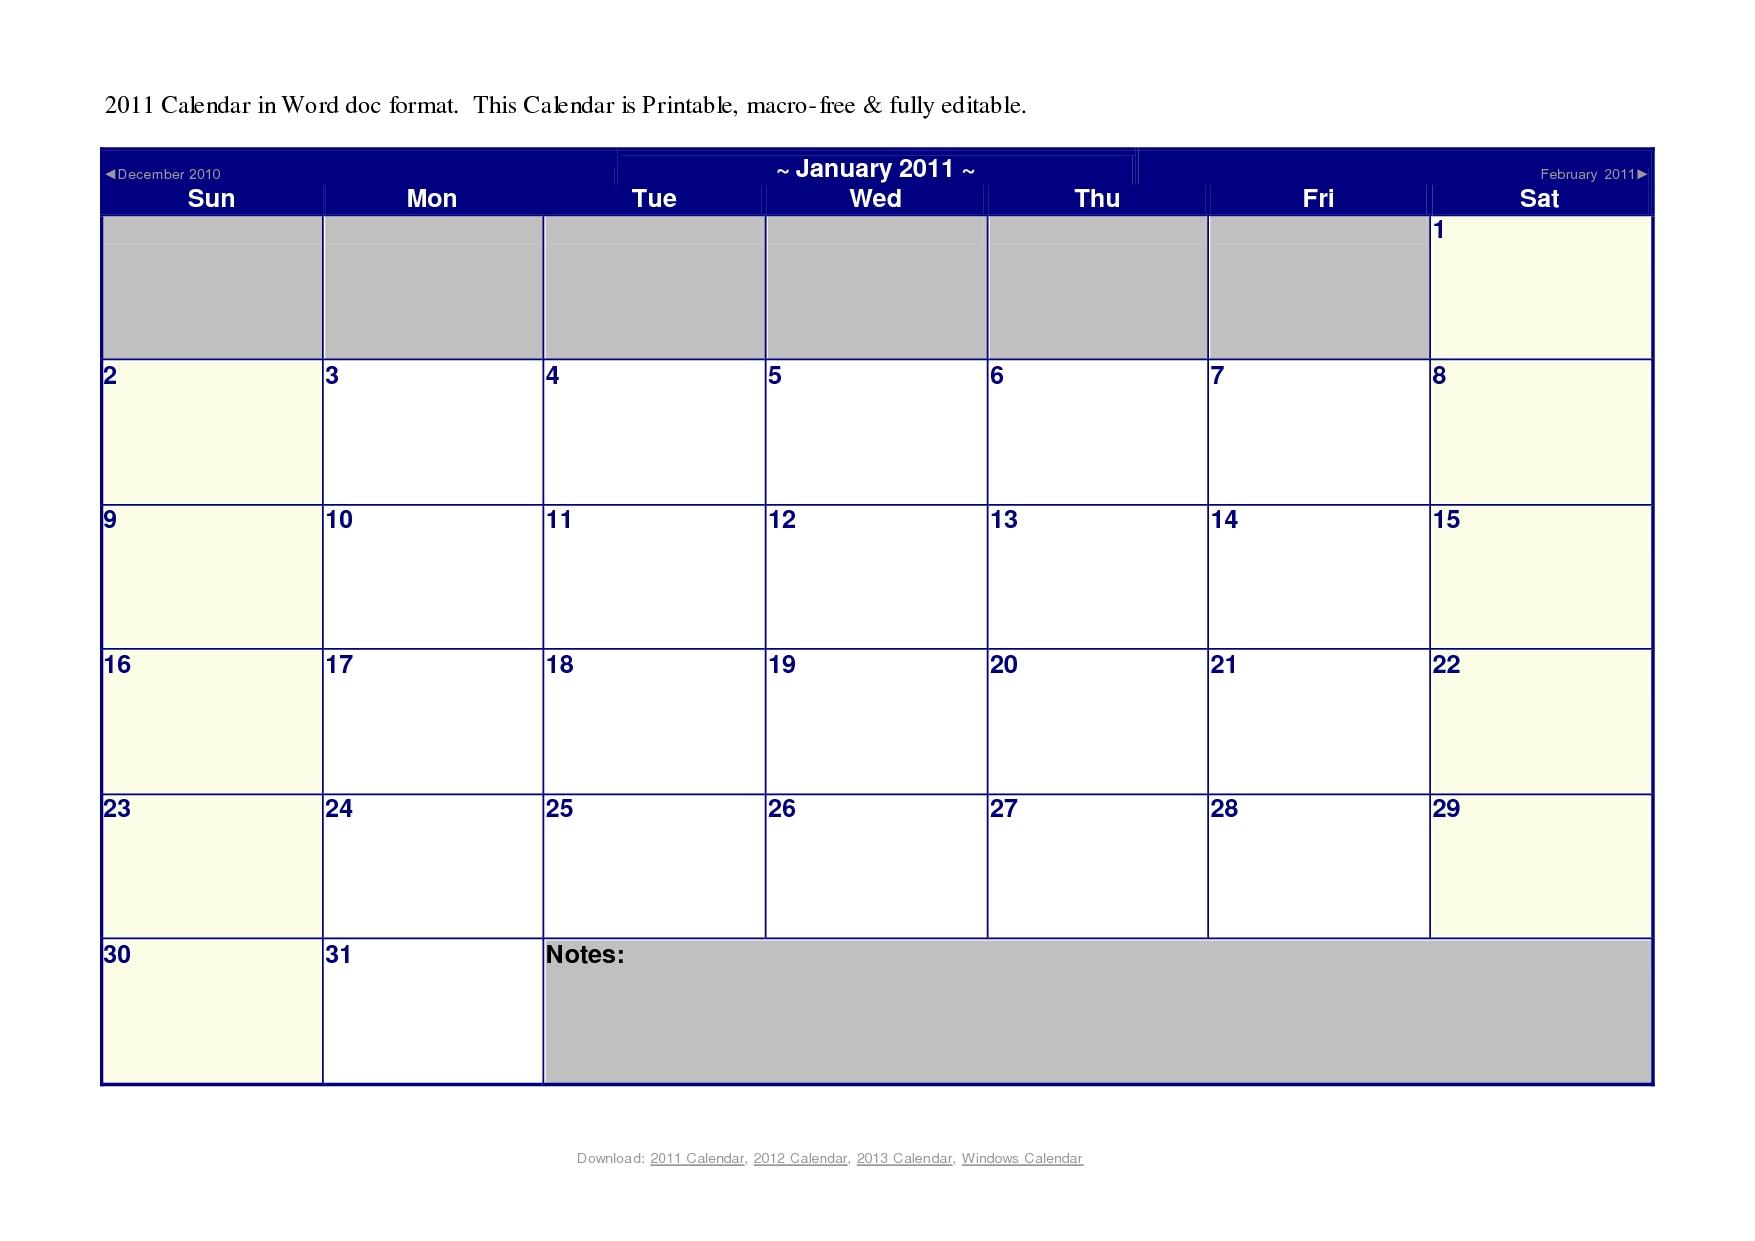 20 Microsoft Blank Calendar Template Images - Microsoft Word Calendar Template Microsoft Word